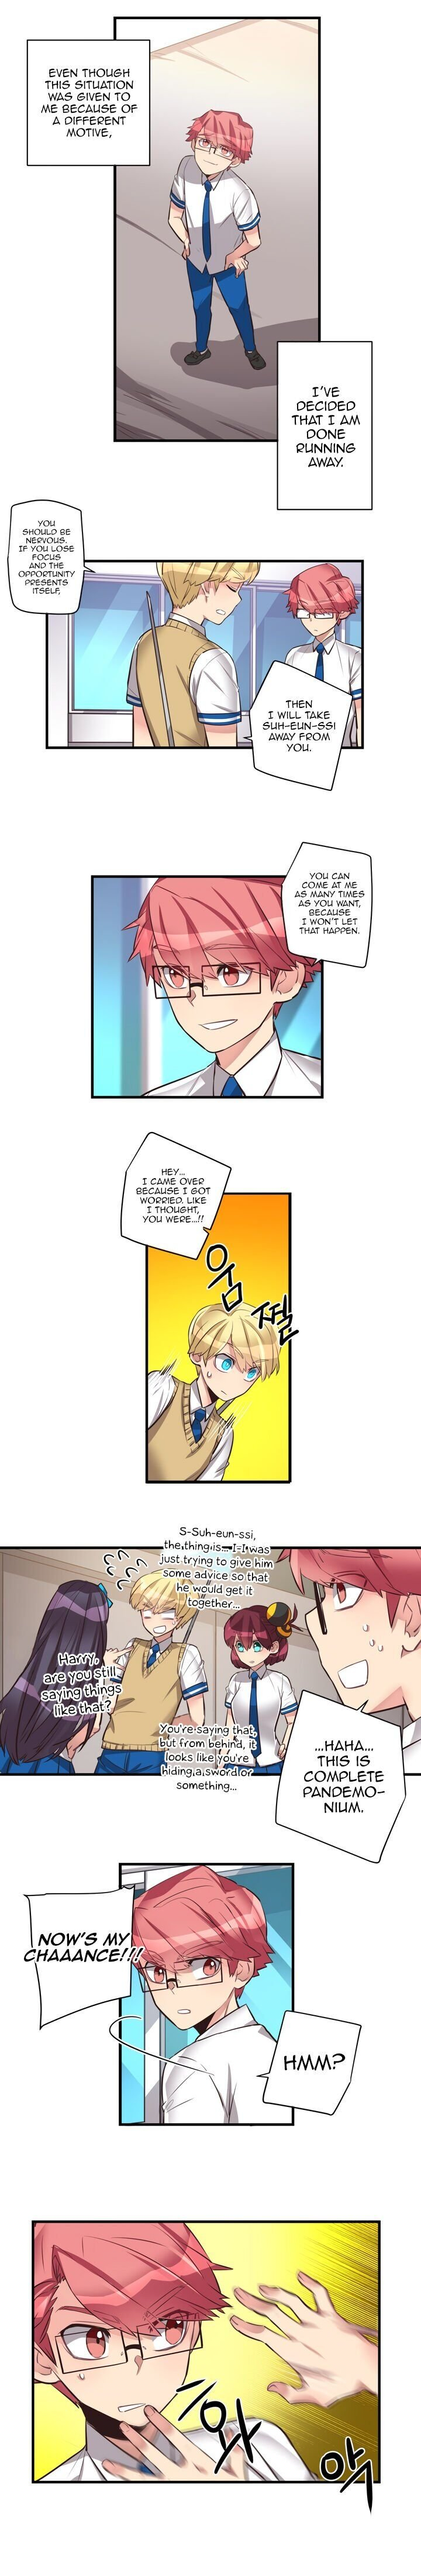 Manga Premarital Relationship - Chapter 80 Page 6